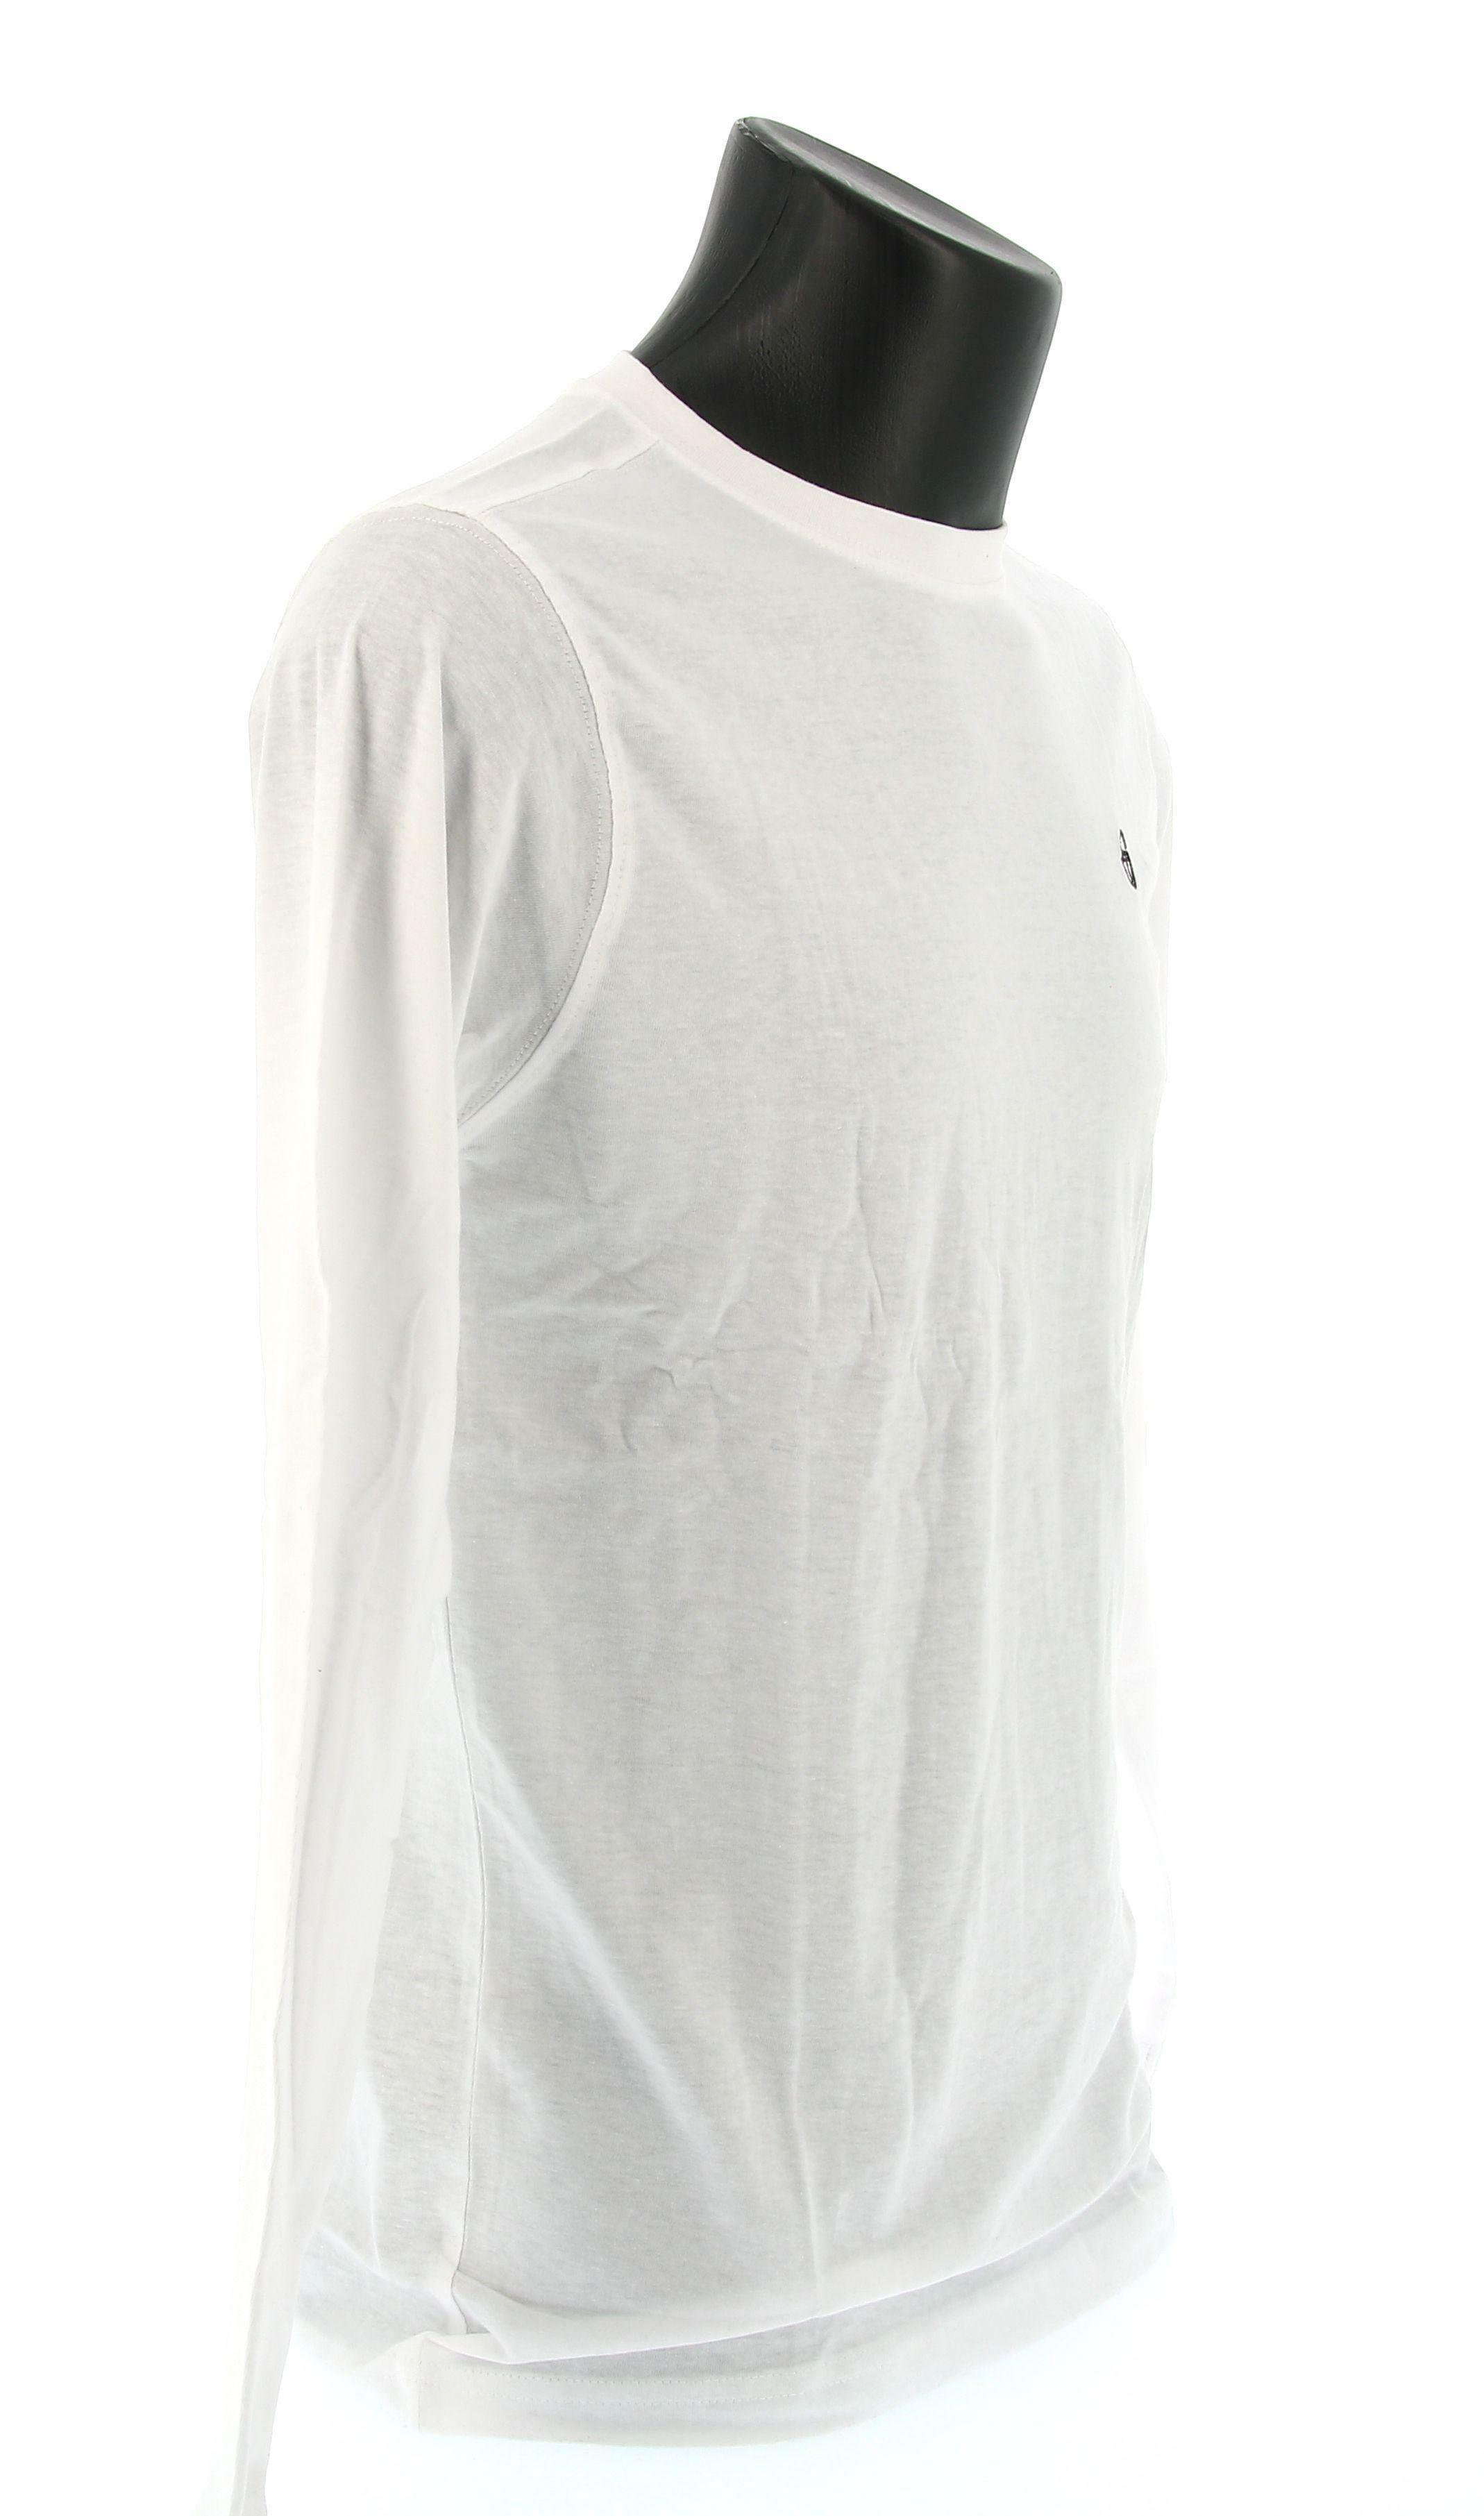 sergio tacchini sergio tacchini sl t-shirt iconic 10006 manica lunga uomo bianca